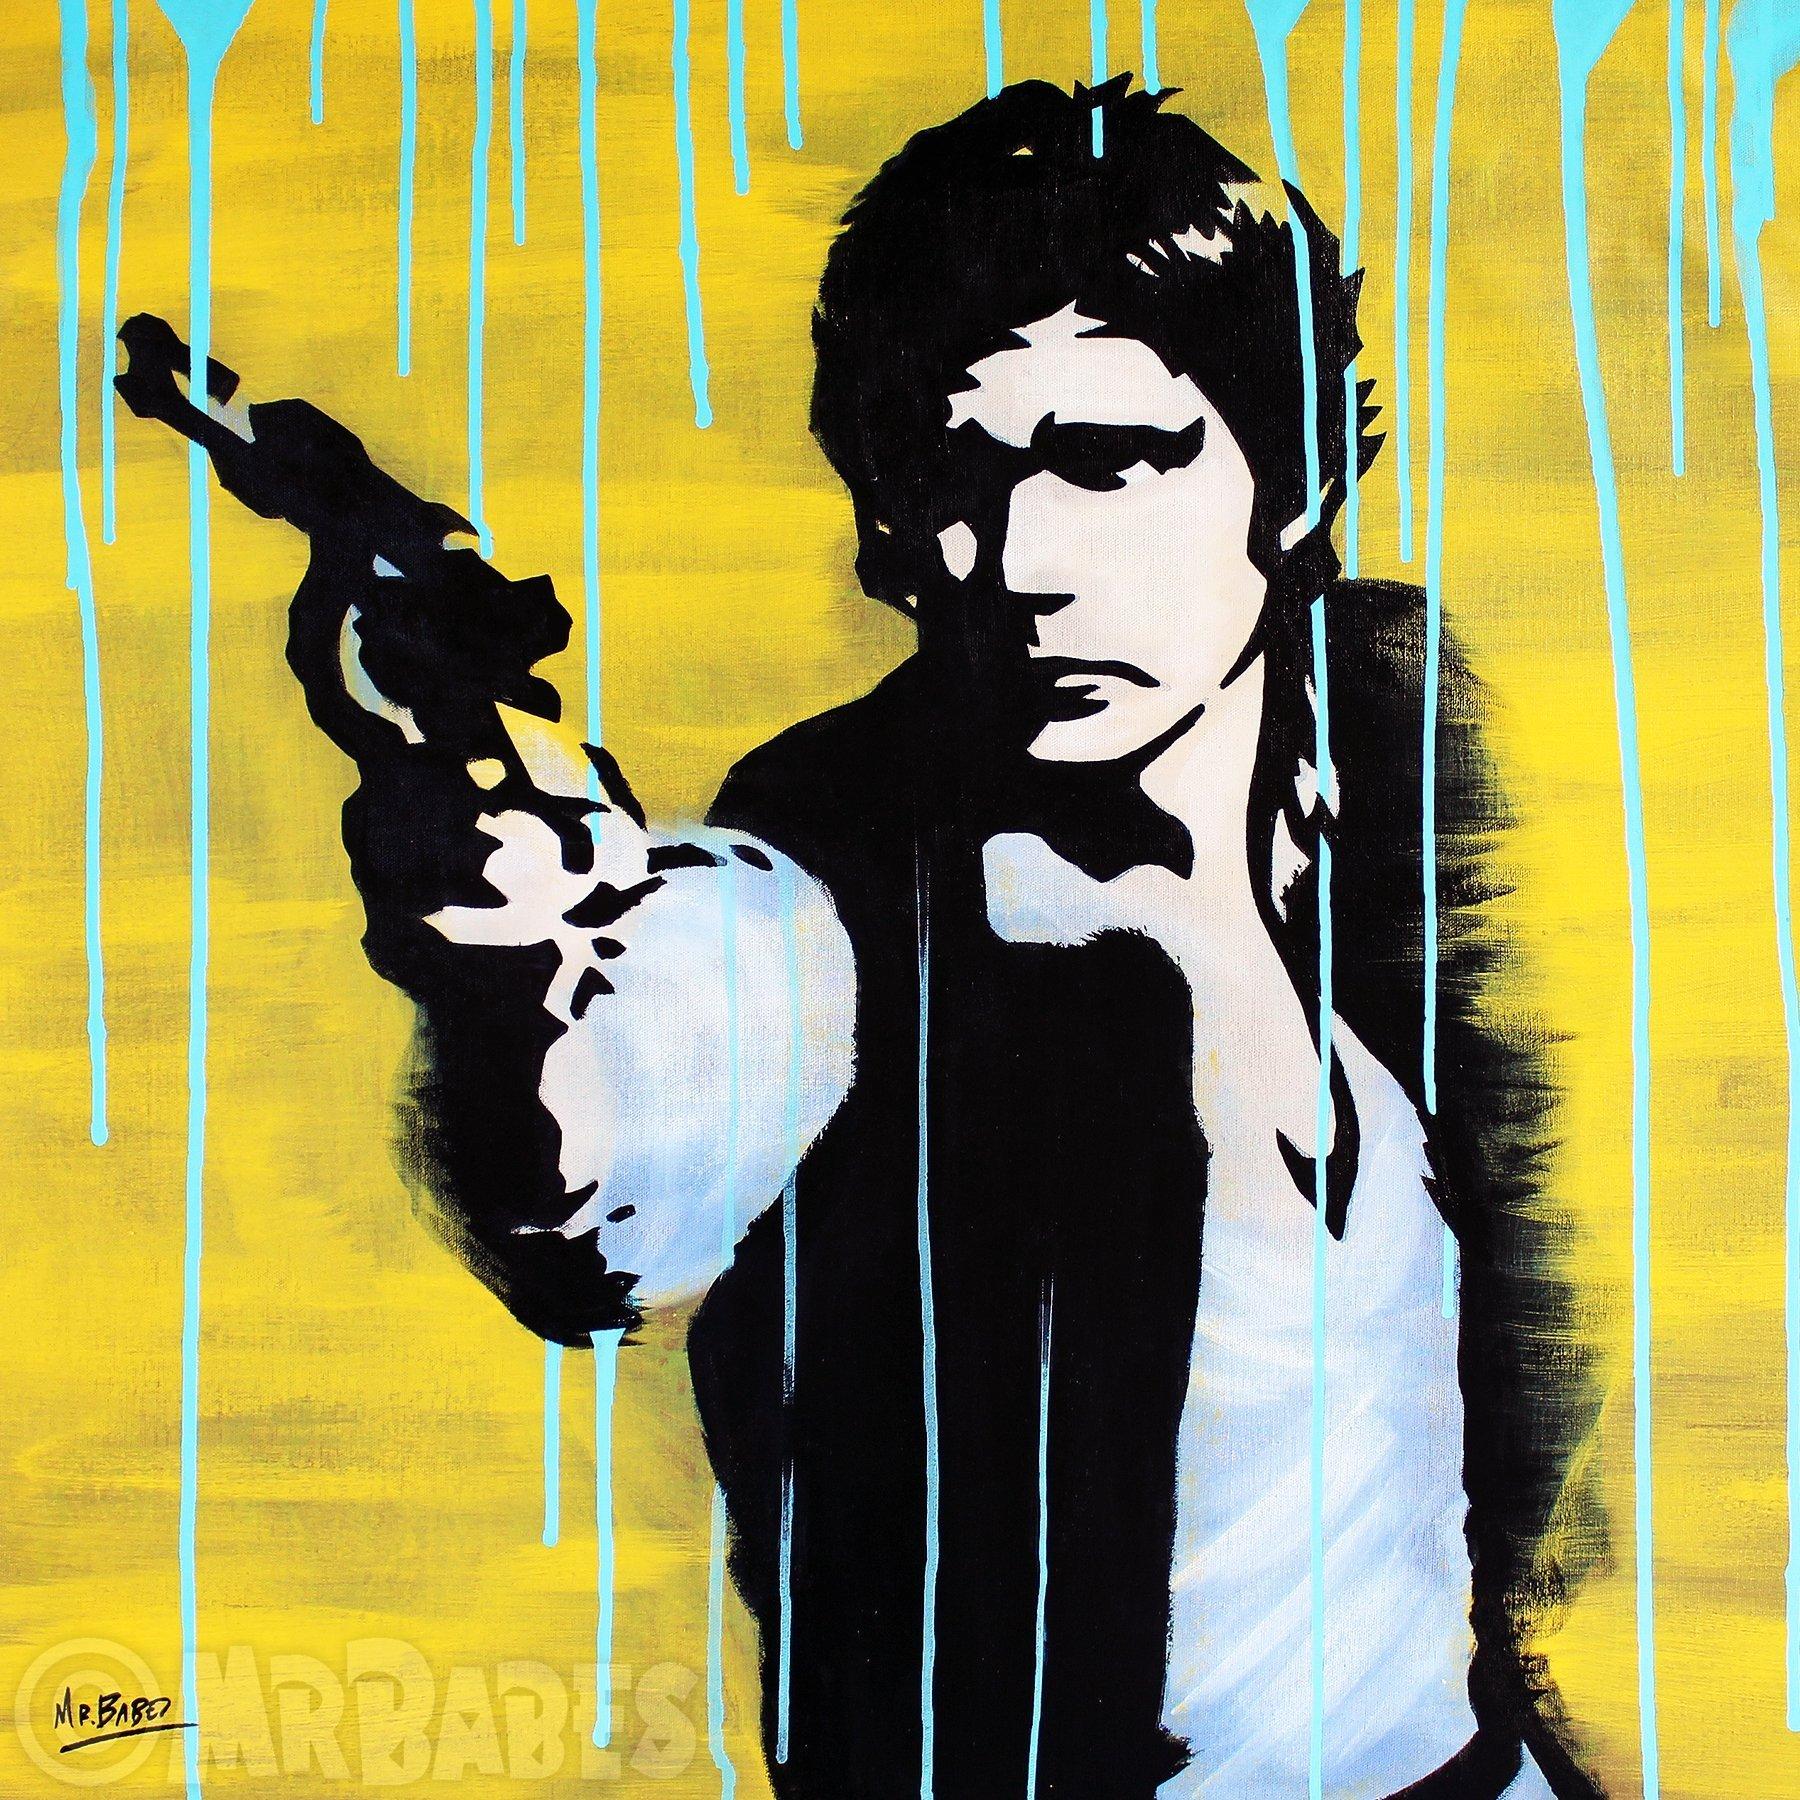 MR.BABES - ''Star Wars: Han Solo (Harrison Ford)'' - Original Pop Art Painting - Movie Portrait